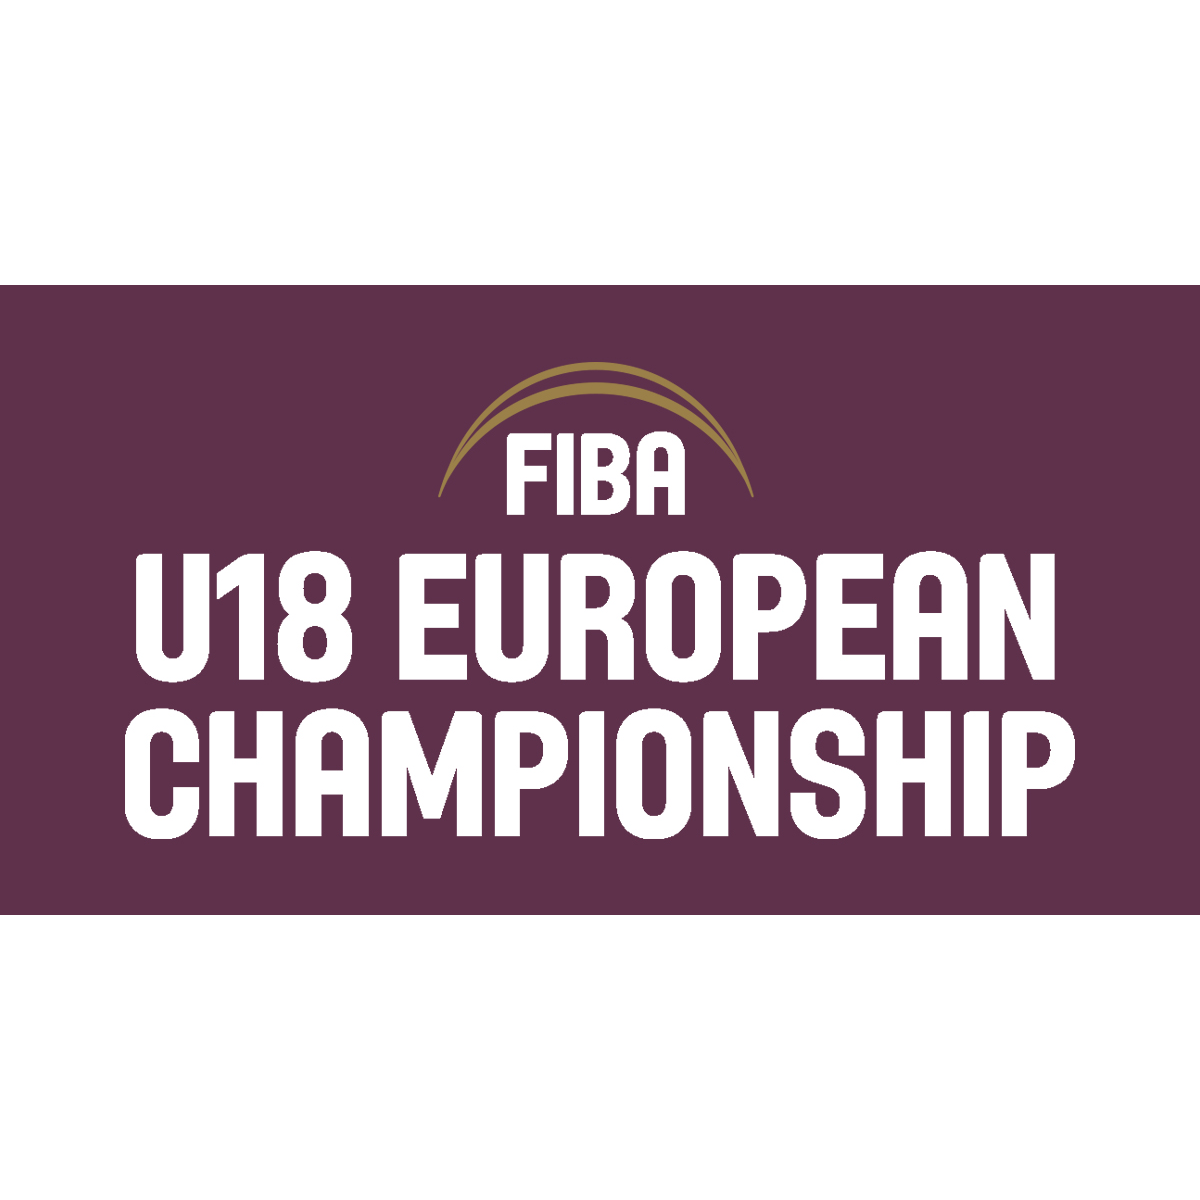 2014 FIBA U18 European Basketball Championship - Division B